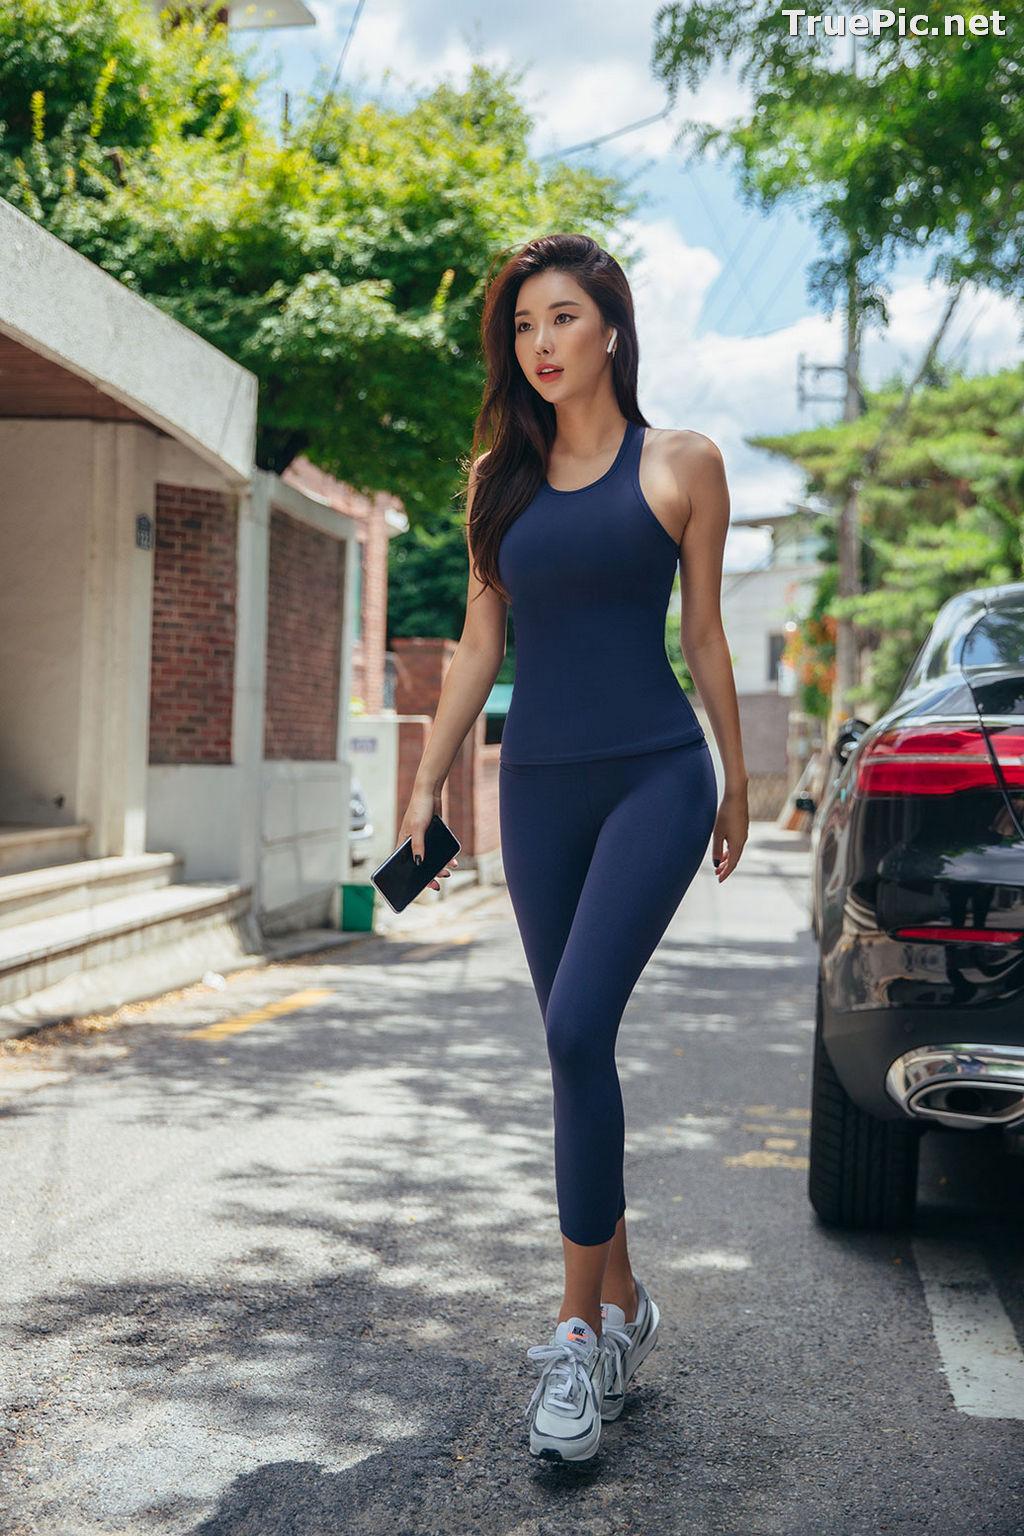 Image Korean Fashion Model - Park Da Hyun - Navy Sportswear - TruePic.net - Picture-12